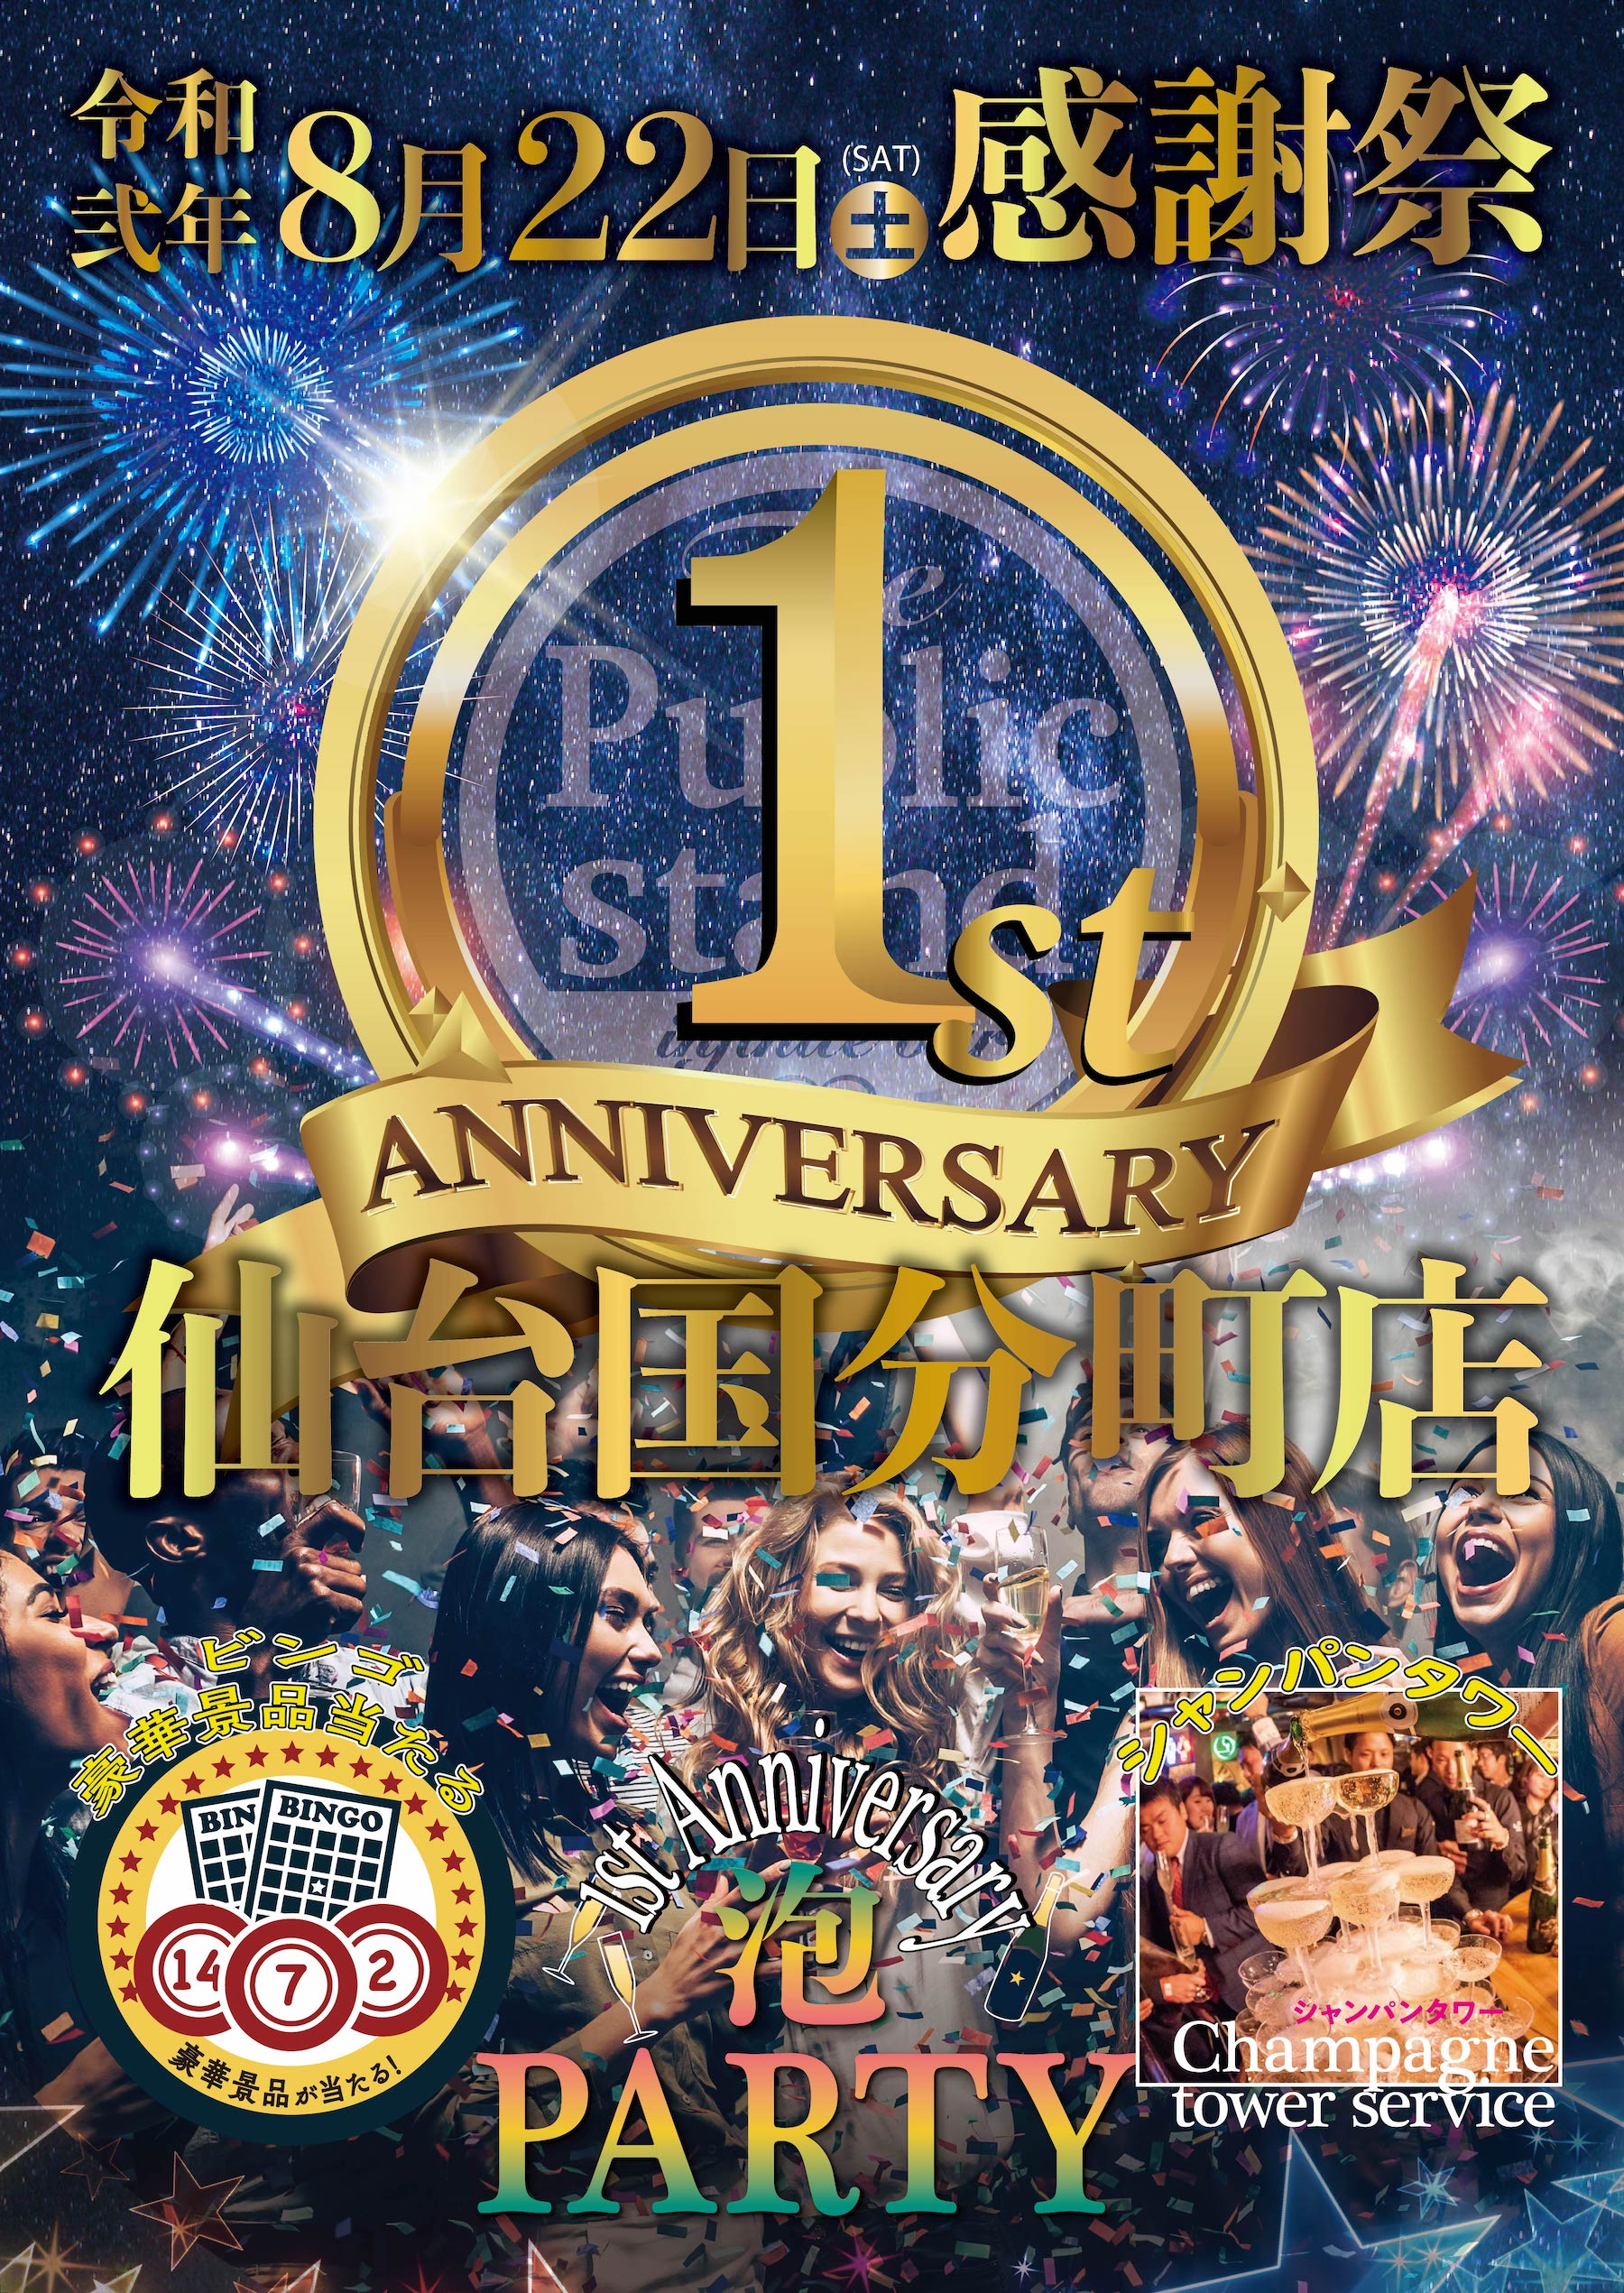 「パブスタ仙台国分町店1周年記念感謝祭」開催決定!